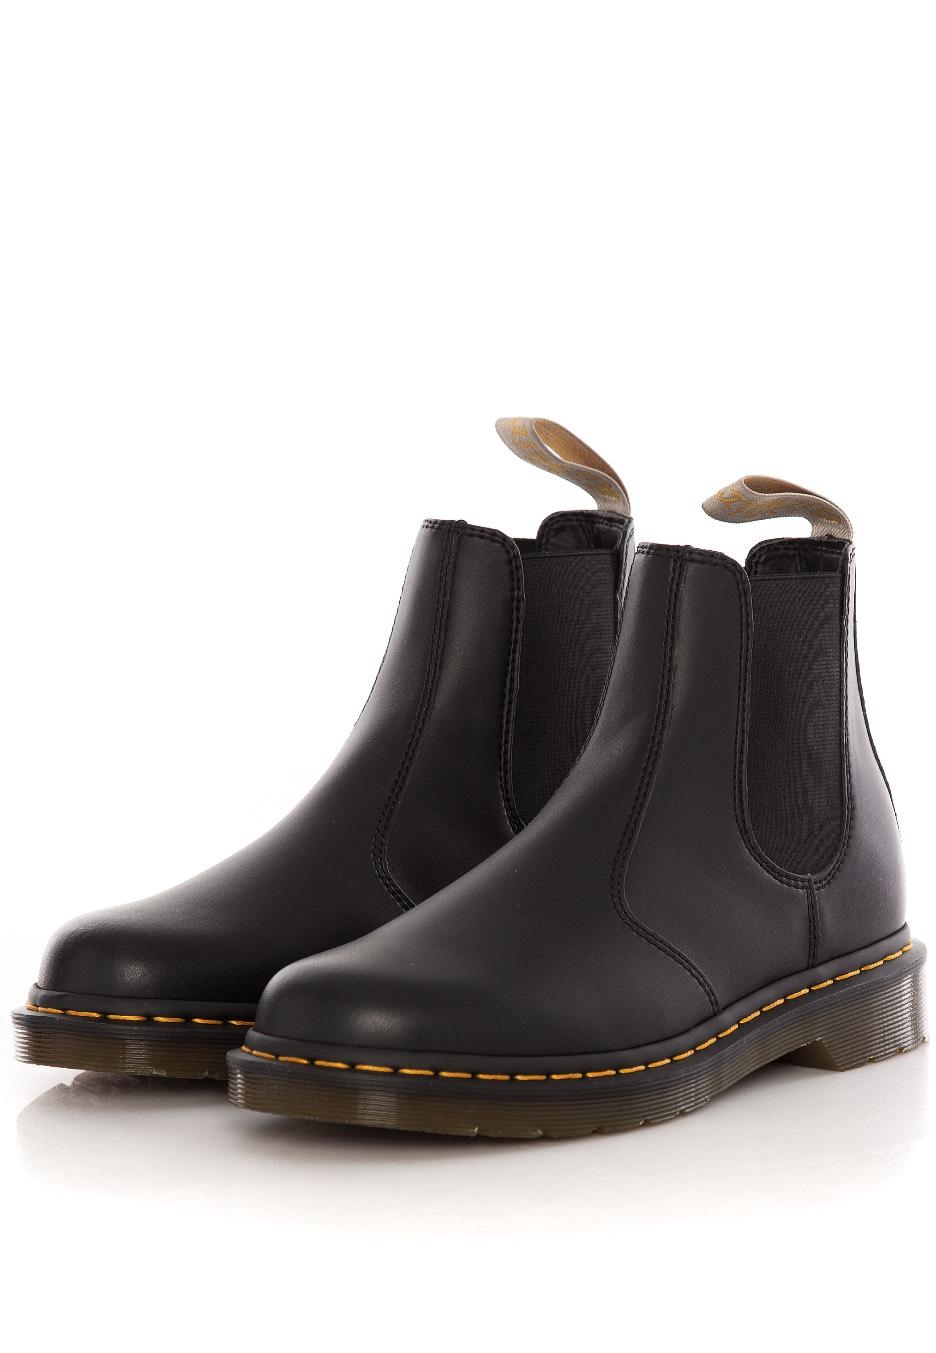 Dr martens vegan flora | Vegan boots, Boots, Chelsea boots